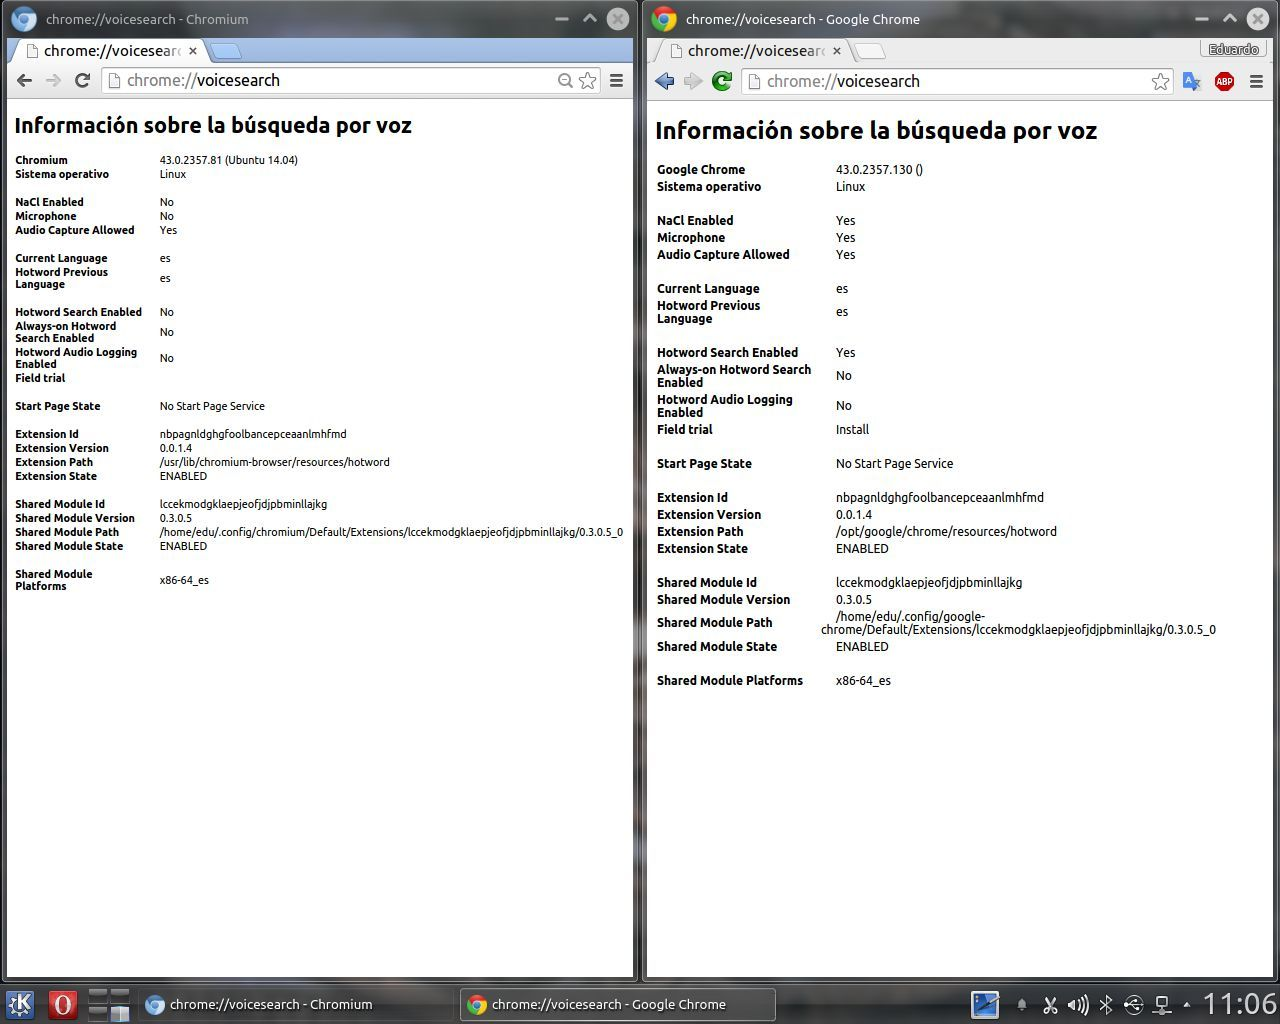 Hotword en Google Chrome y en Chromium